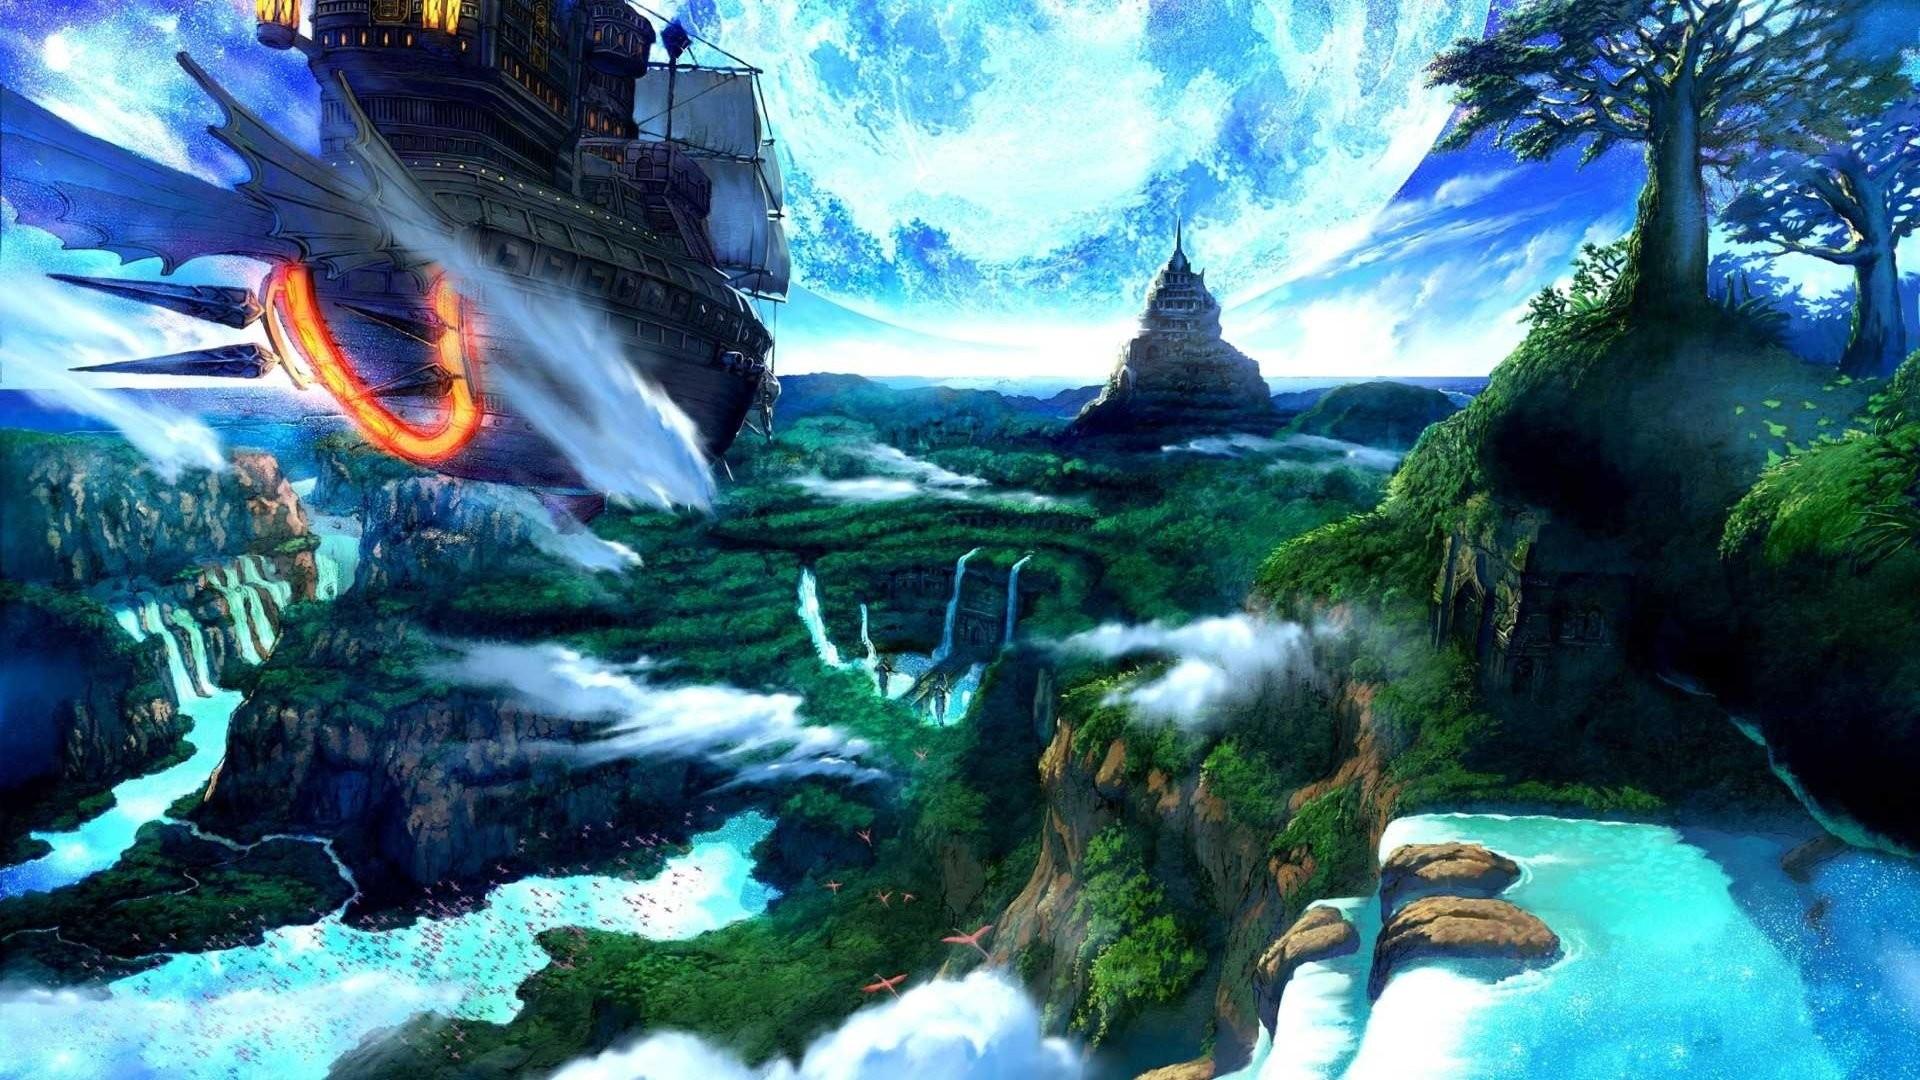 Mystical Wallpaper (57+ images)